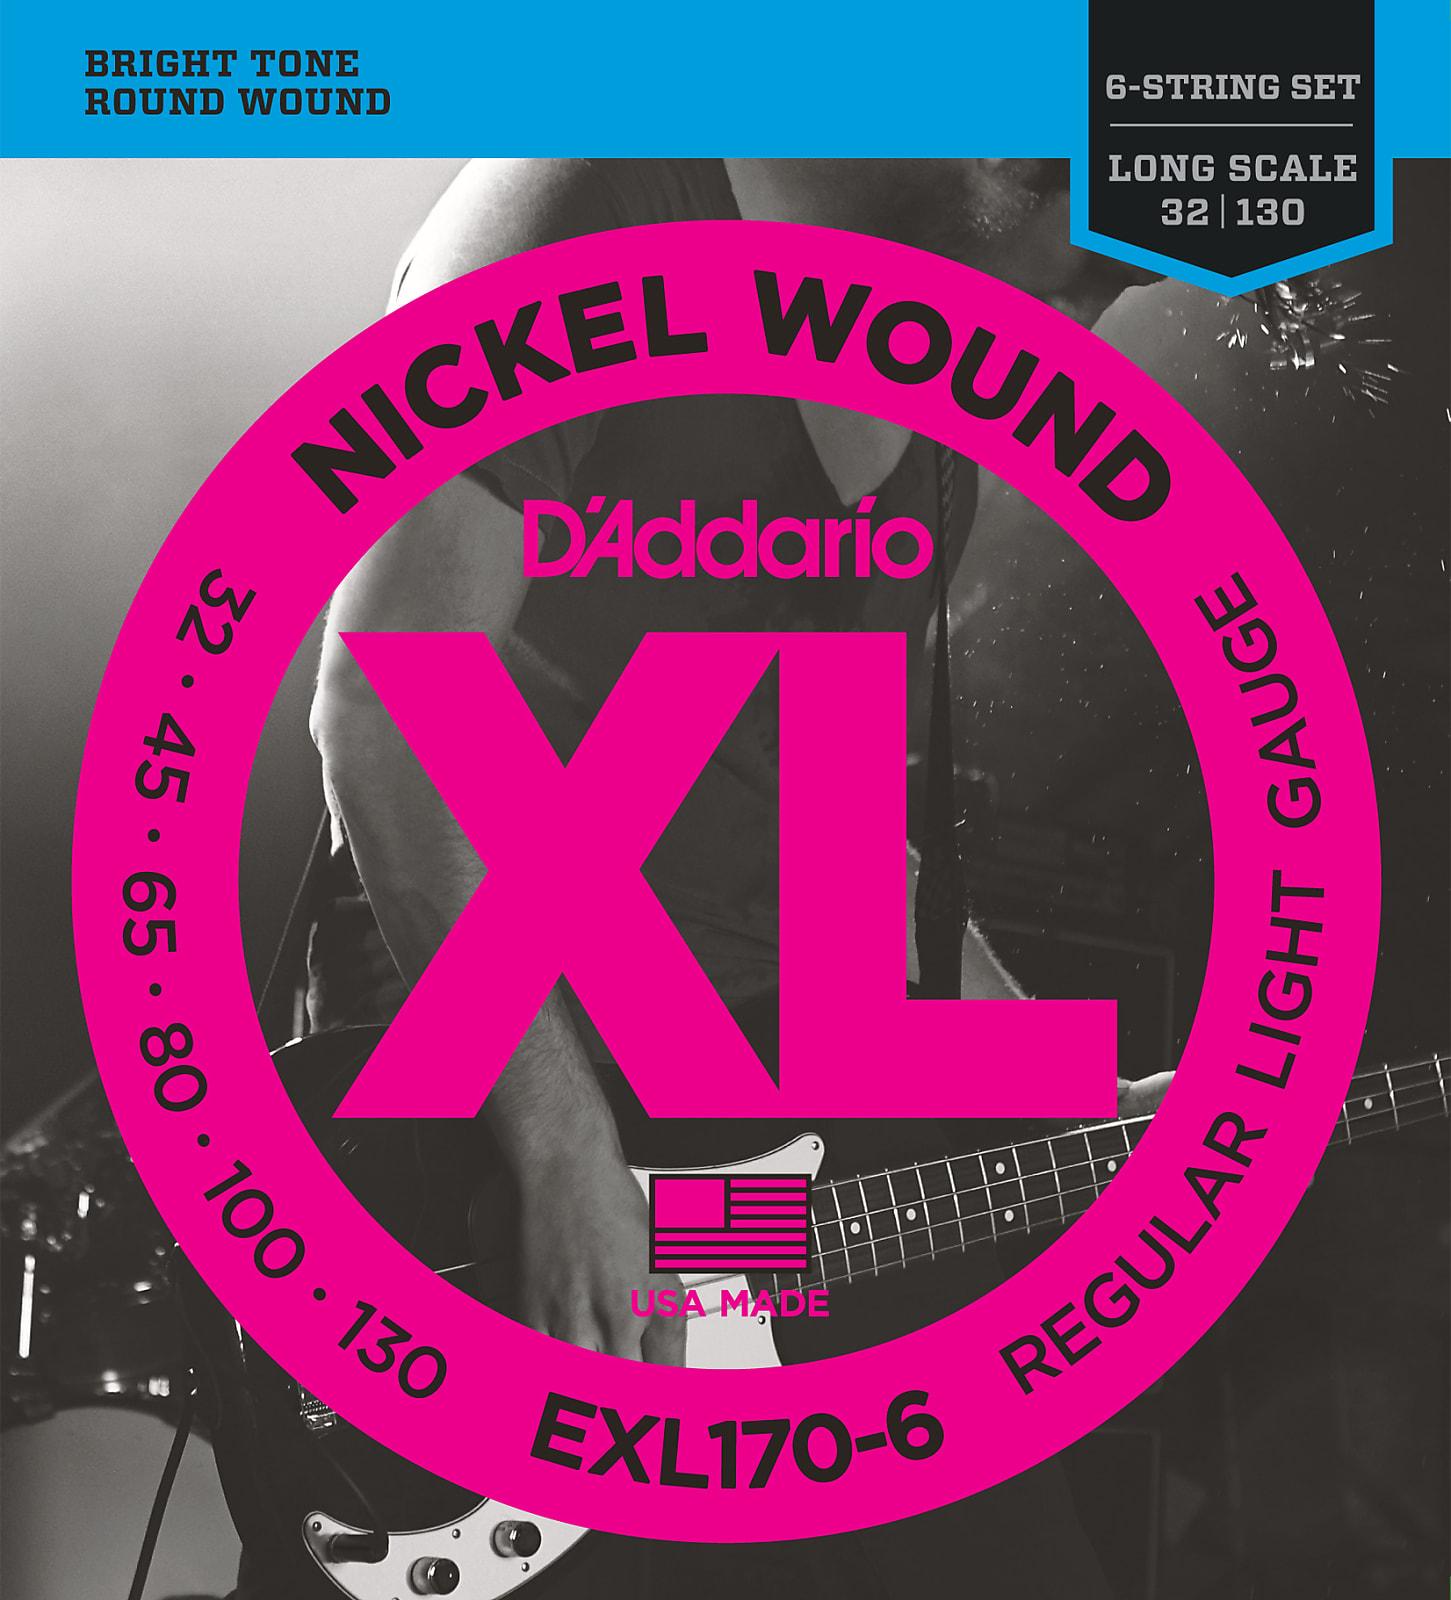 D'Addario EXL170-6 6-String Nickel Wound Bass Guitar Strings, Light, 32-130, Lo